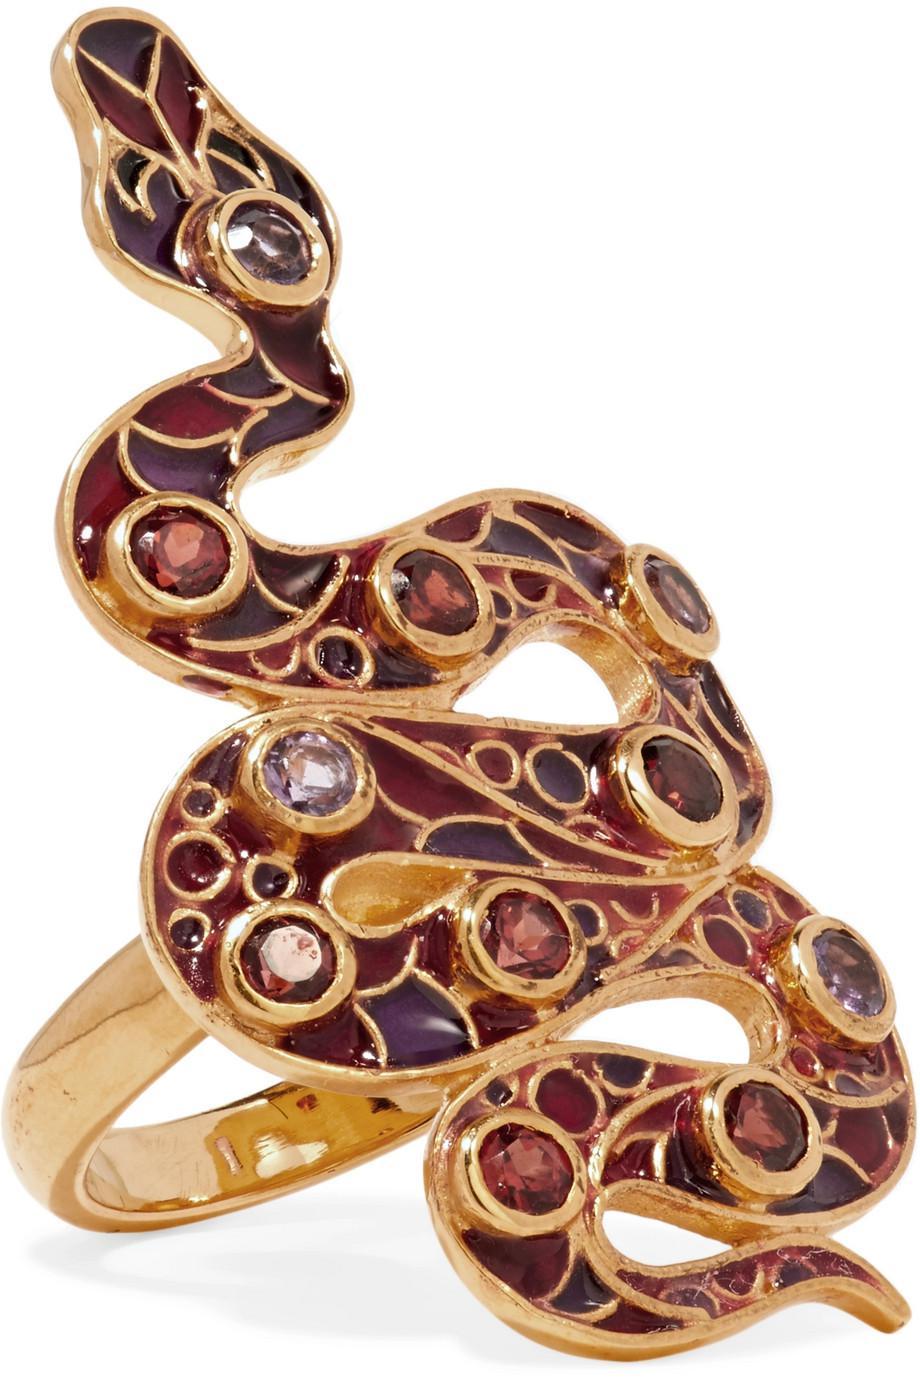 Percossi Papi 9-karat Gold And Enamel Garnet And Amethyst Ring - Purple QpcMsQ1Rz